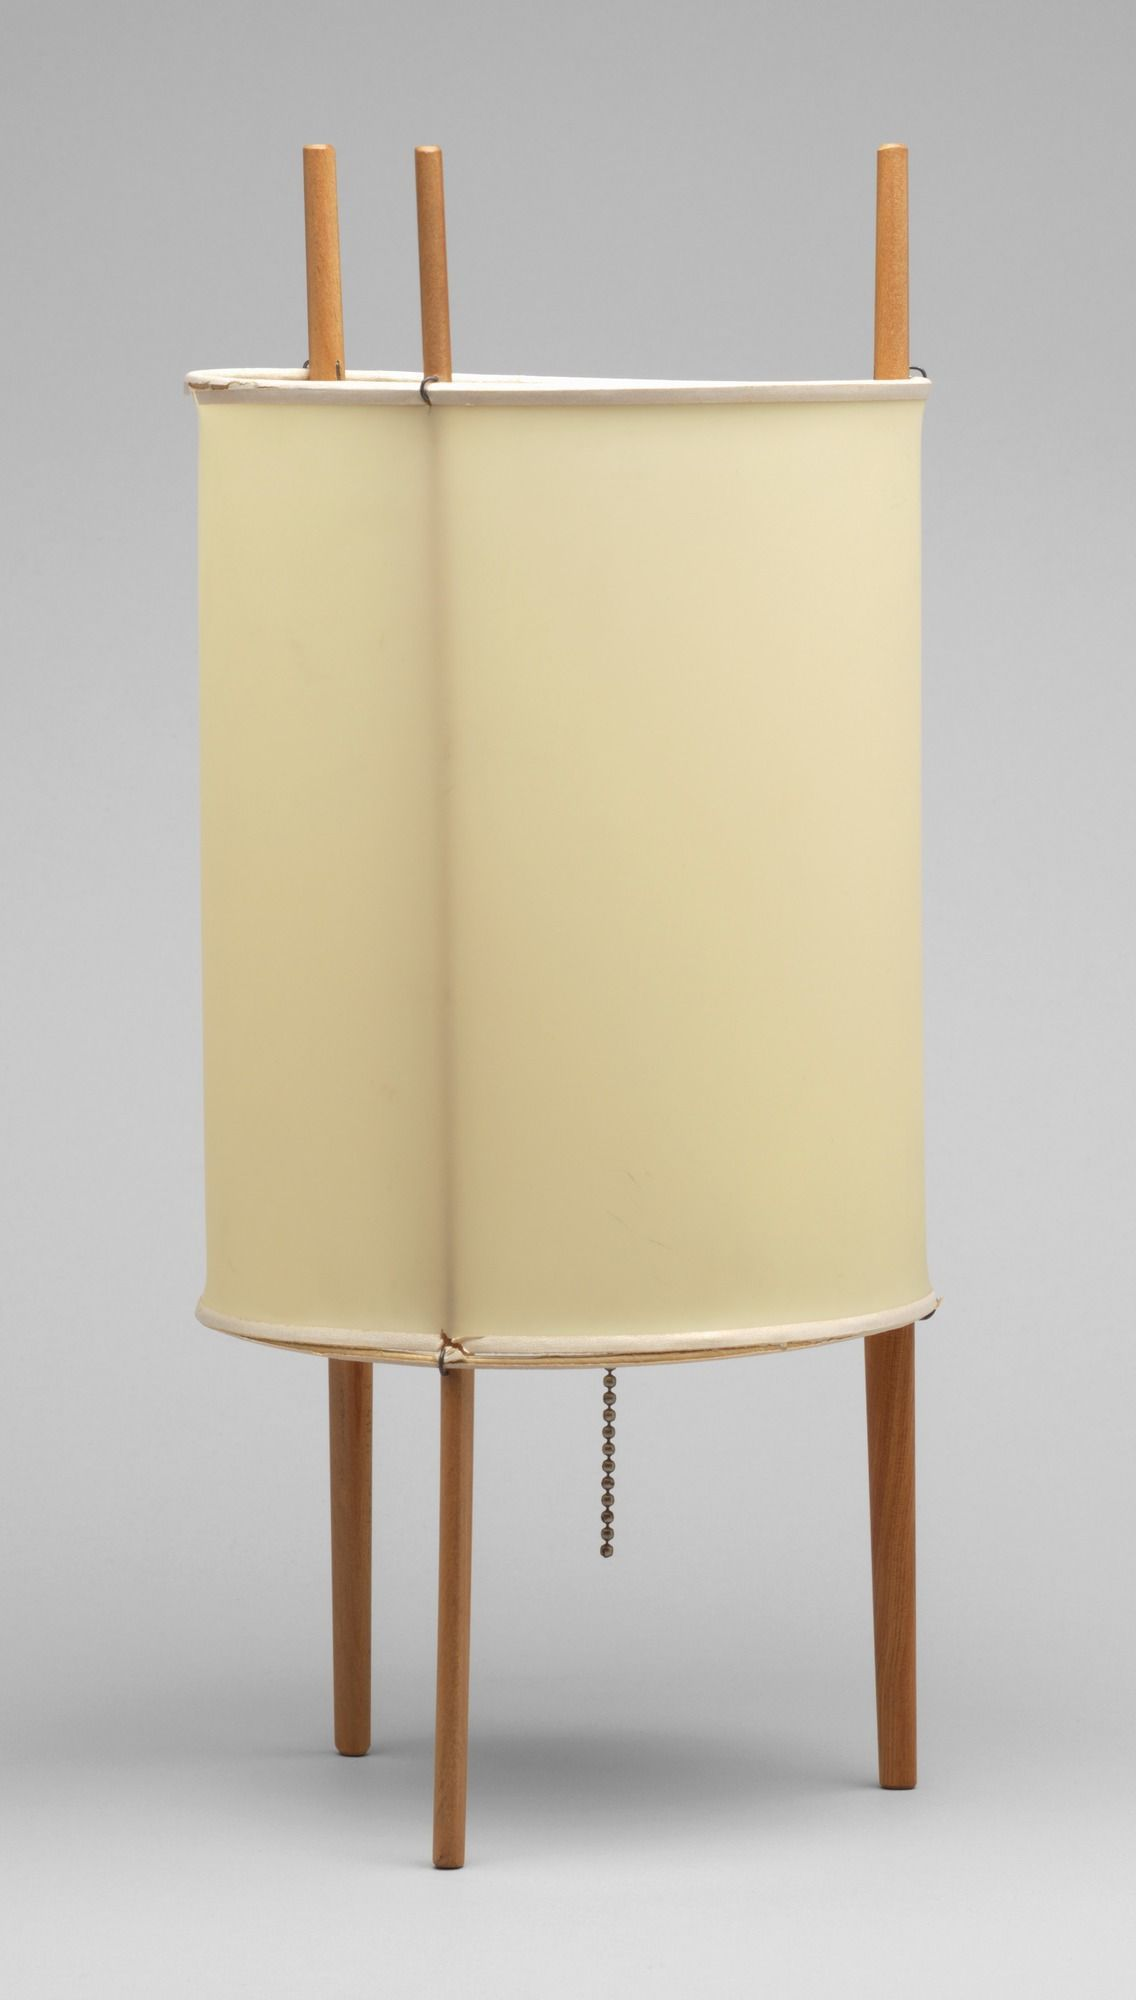 NoguchiTable Isamu Lamp1948 NoguchiTable ManufacturerKnoll ManufacturerKnoll Isamu Isamu Lamp1948 NoguchiTable Isamu ManufacturerKnoll Lamp1948 5j3AL4Rq